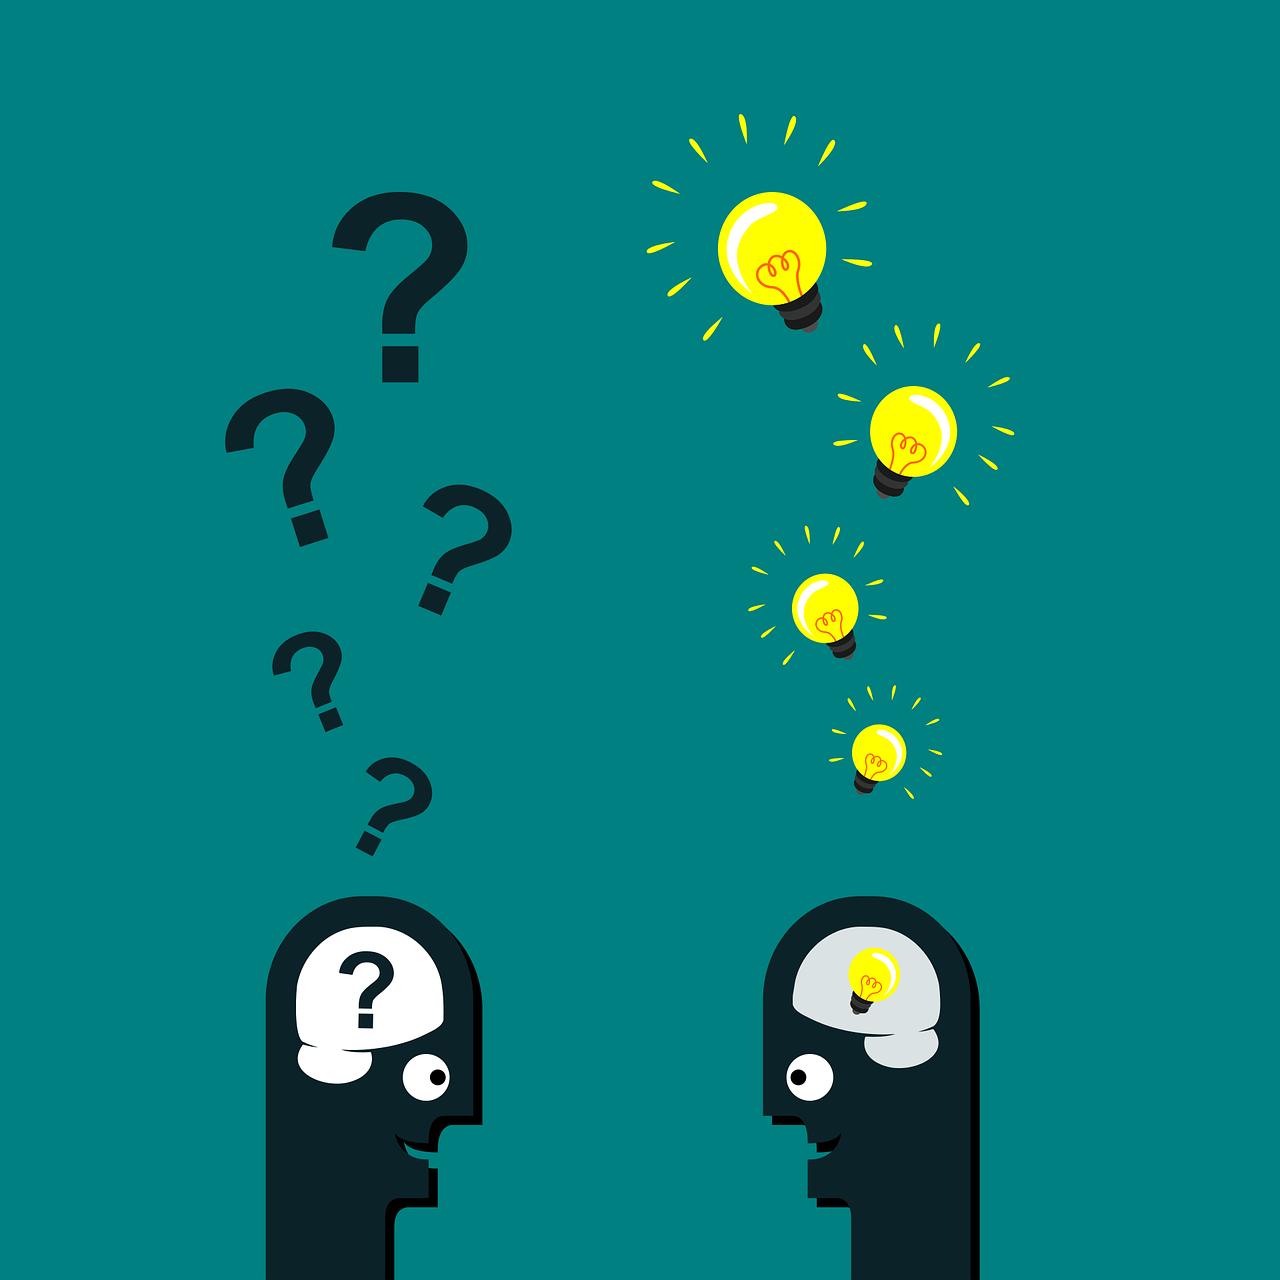 How social entrepreneurship helps to educate the world?